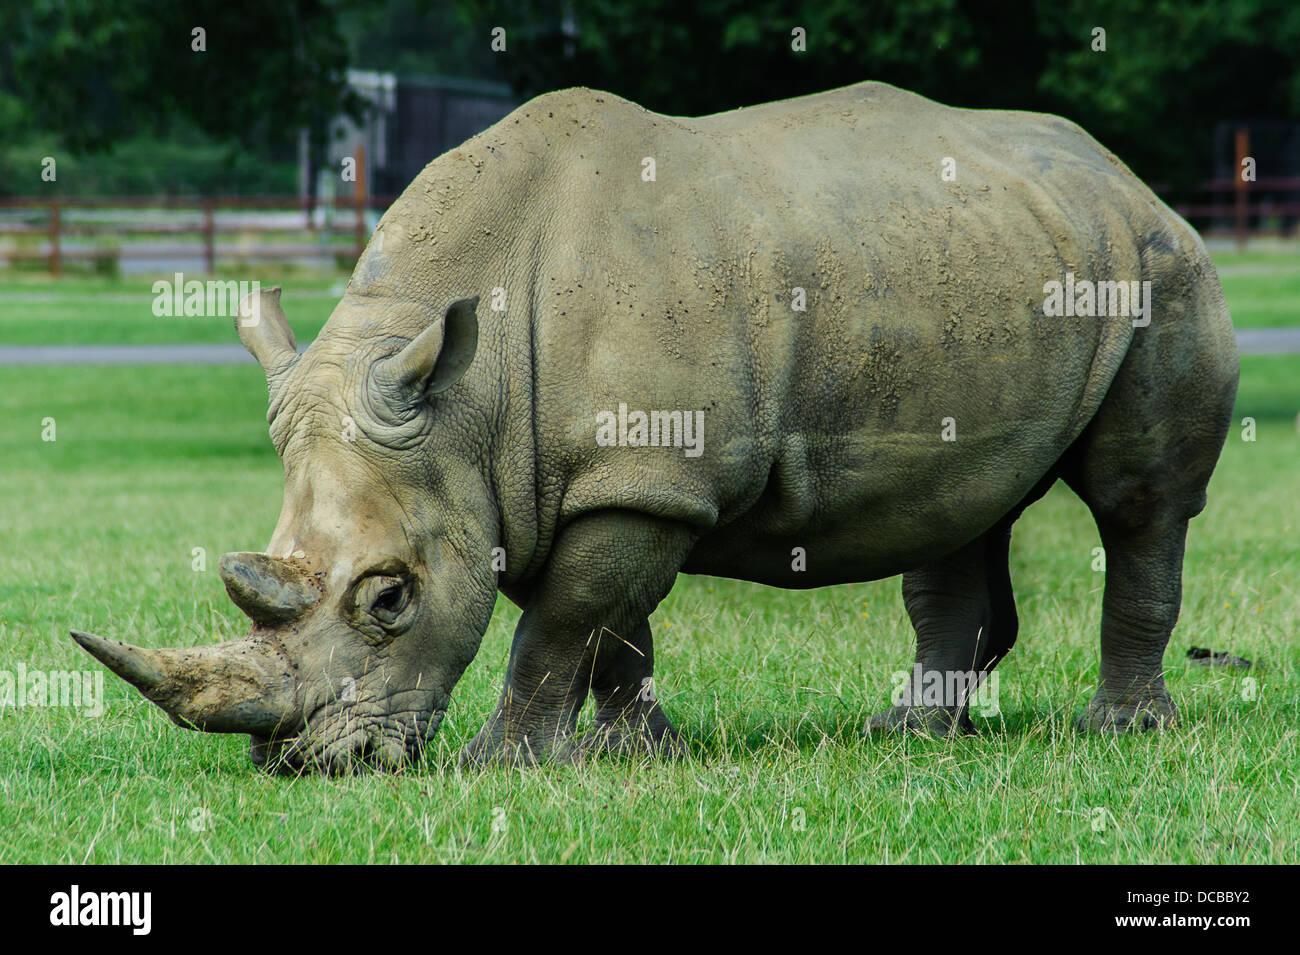 Rhino's at Longleat Animals Wildlife Safari Park - Stock Image